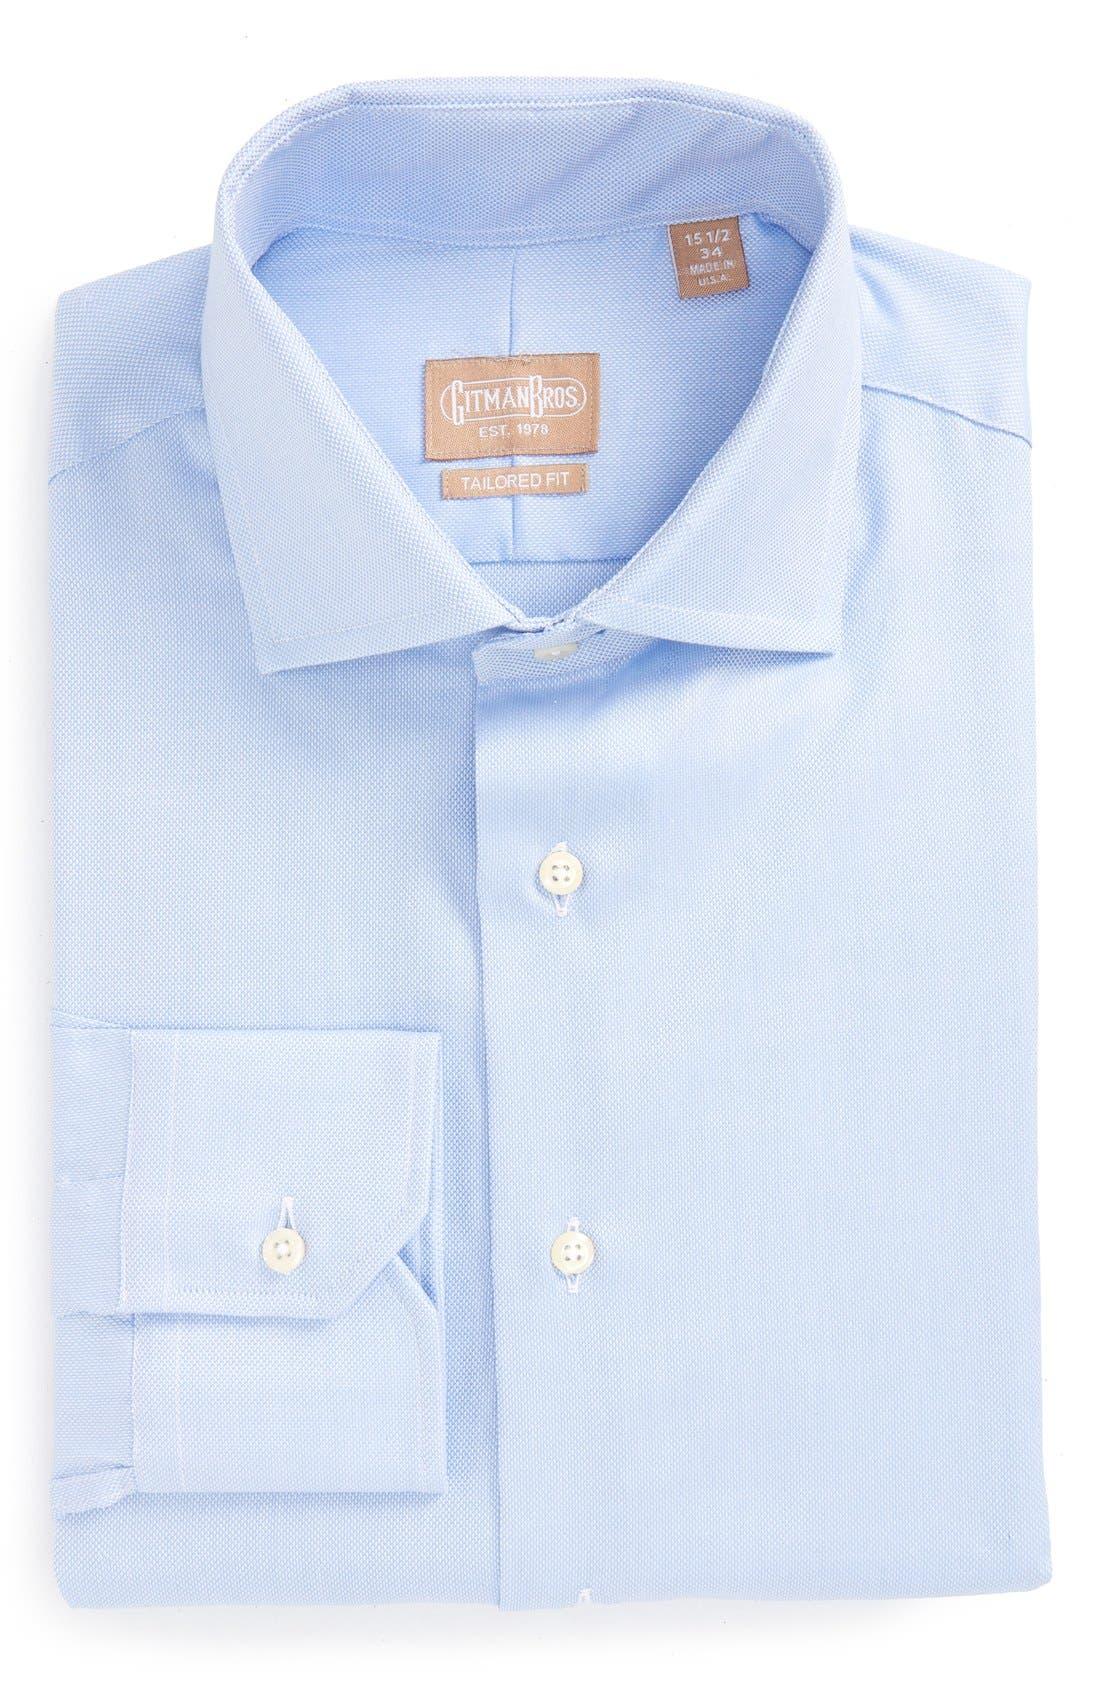 GITMAN Royal Oxford Tailored Fit Dress Shirt, Main, color, BLUE